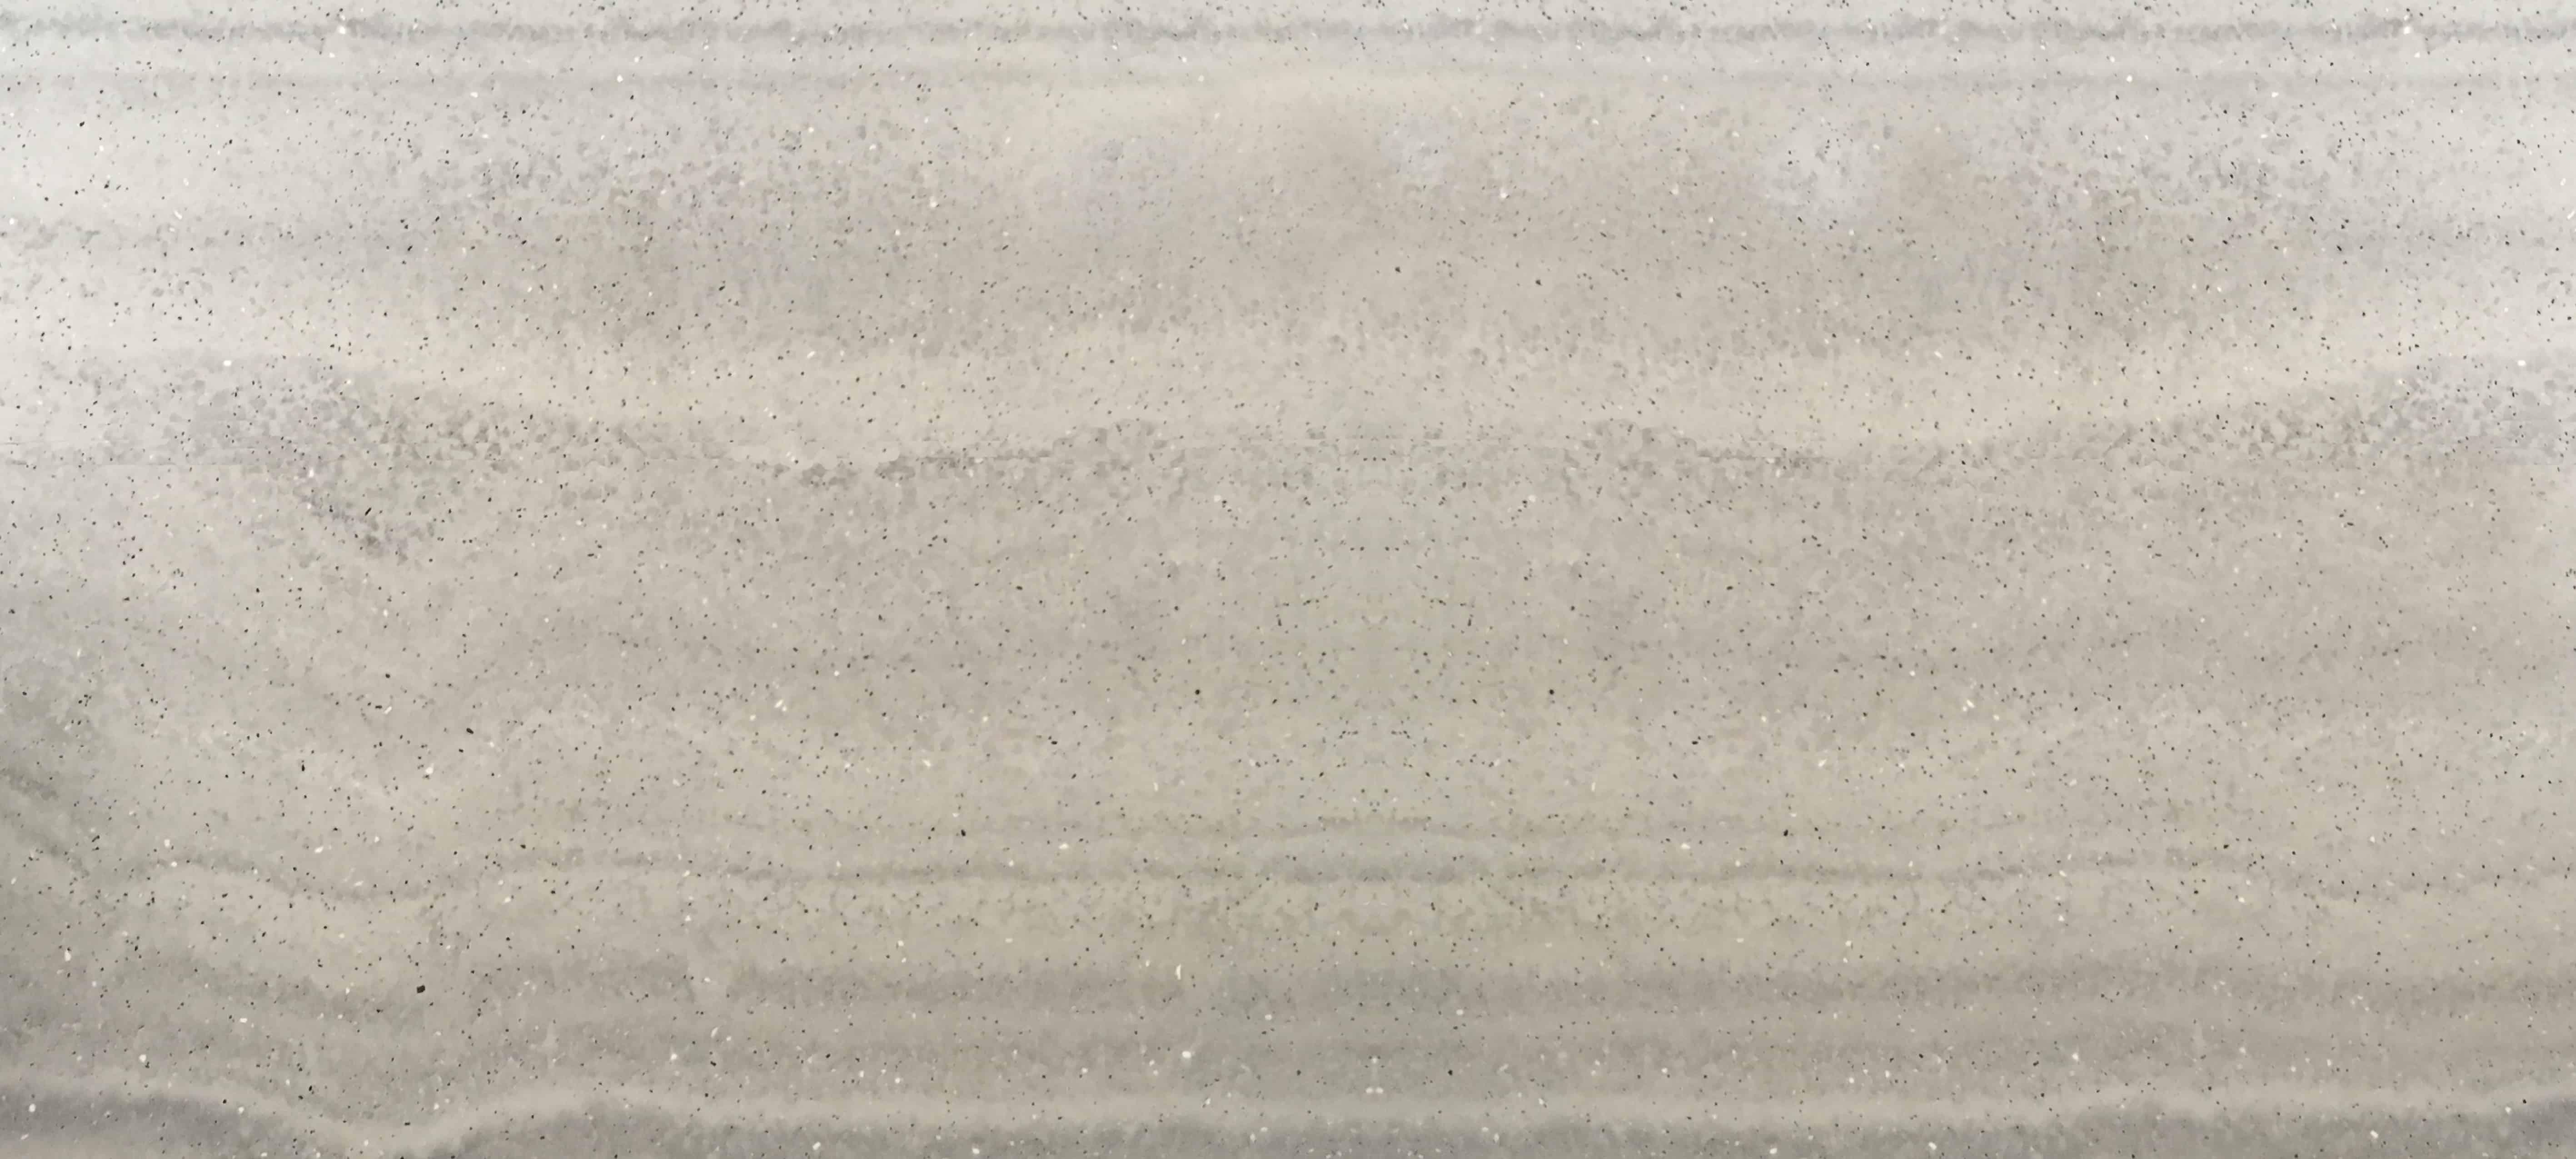 Marmo Venato - Veined Apollo Slab